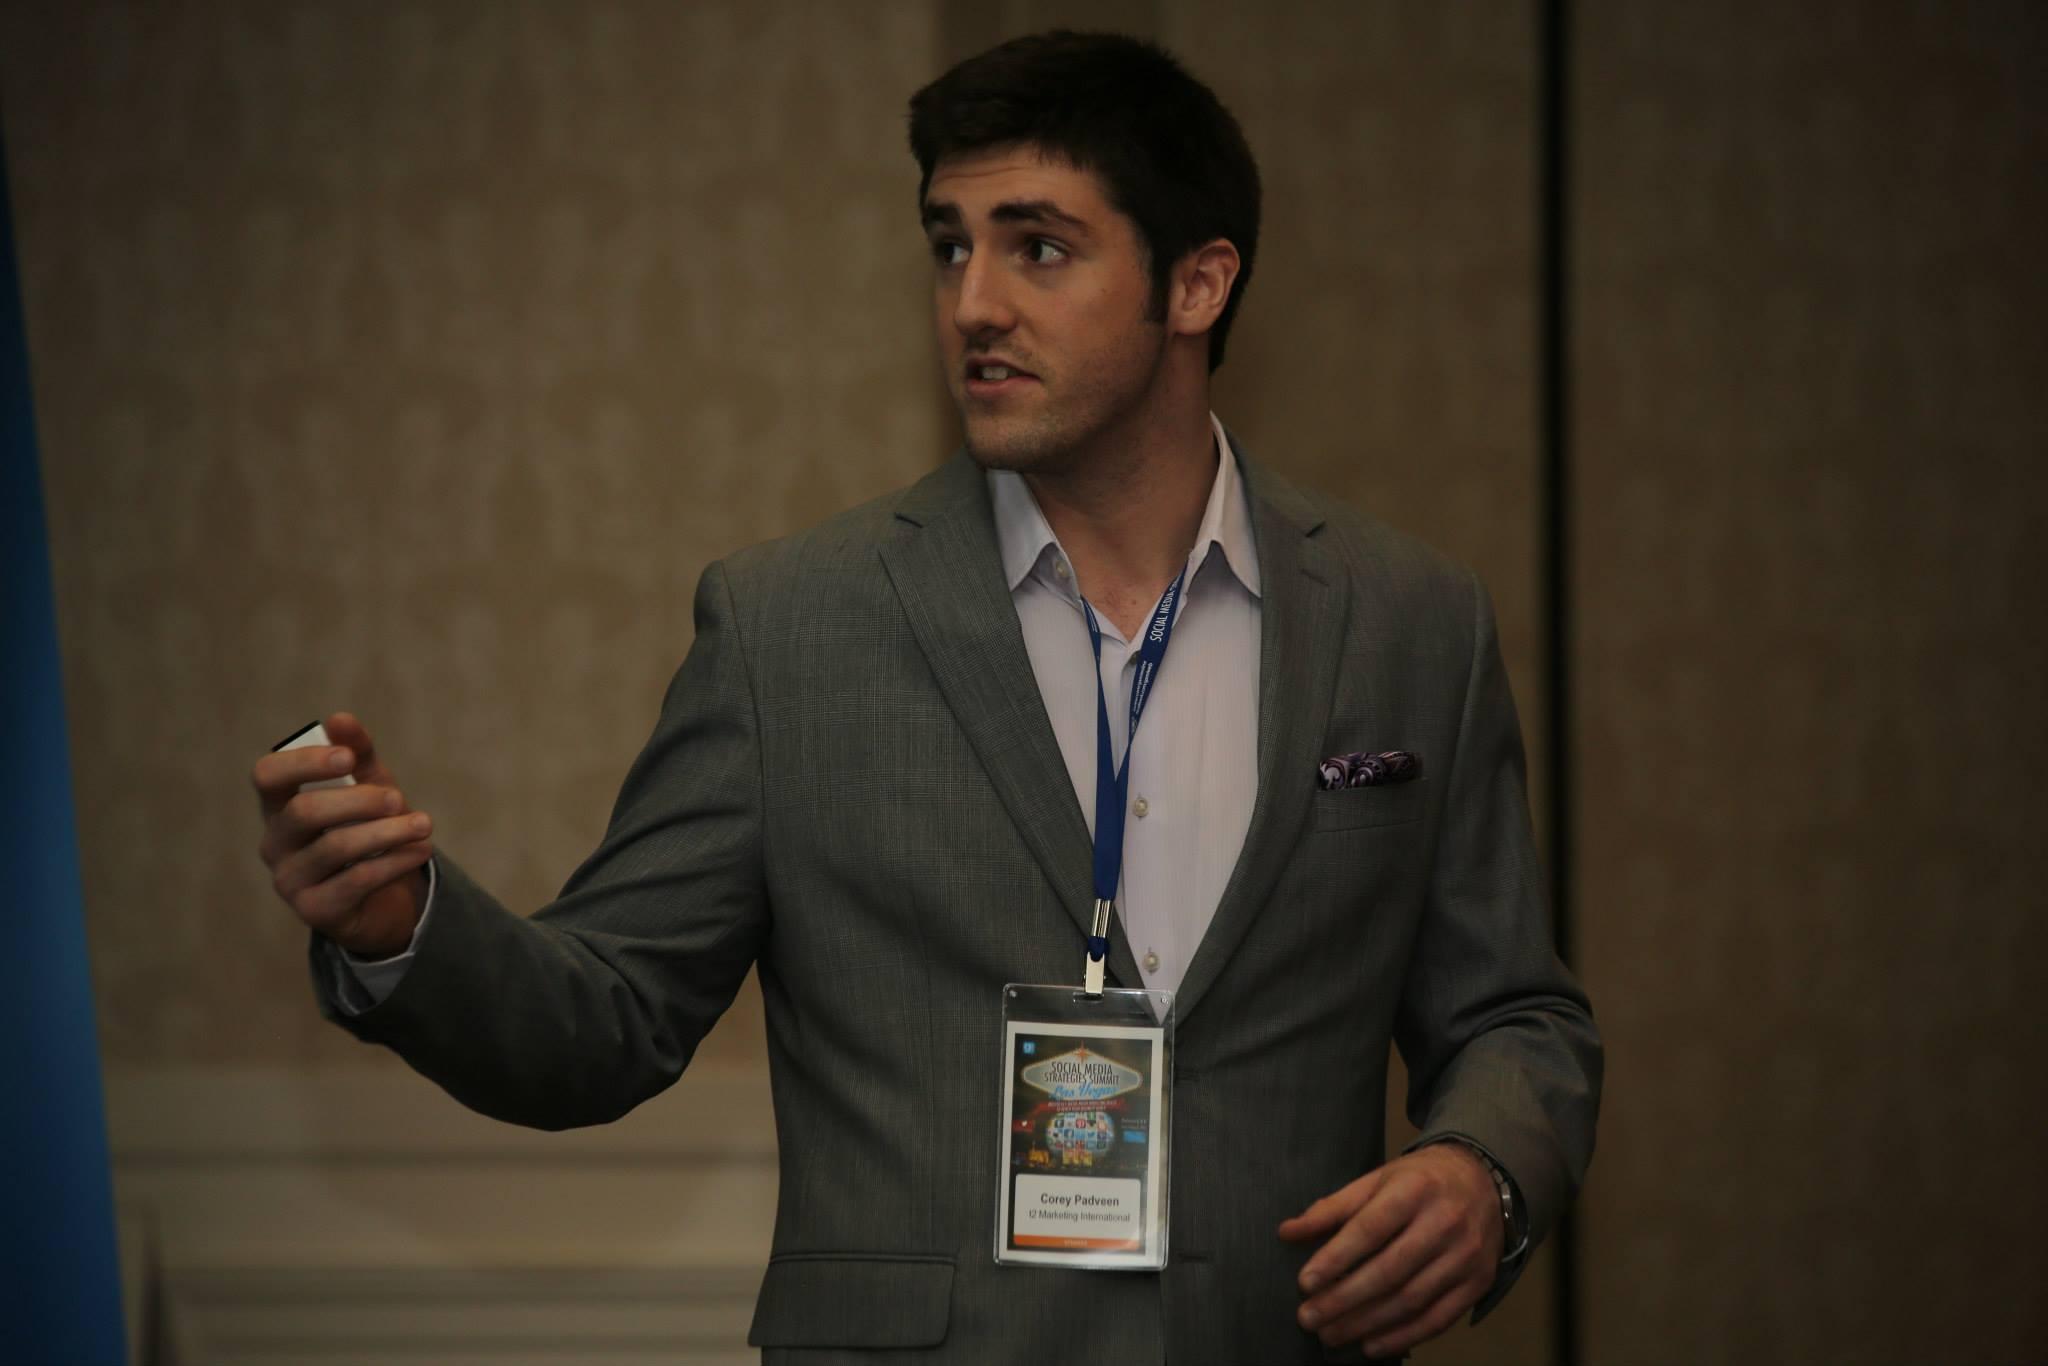 Corey Padveen Marketing Speaker